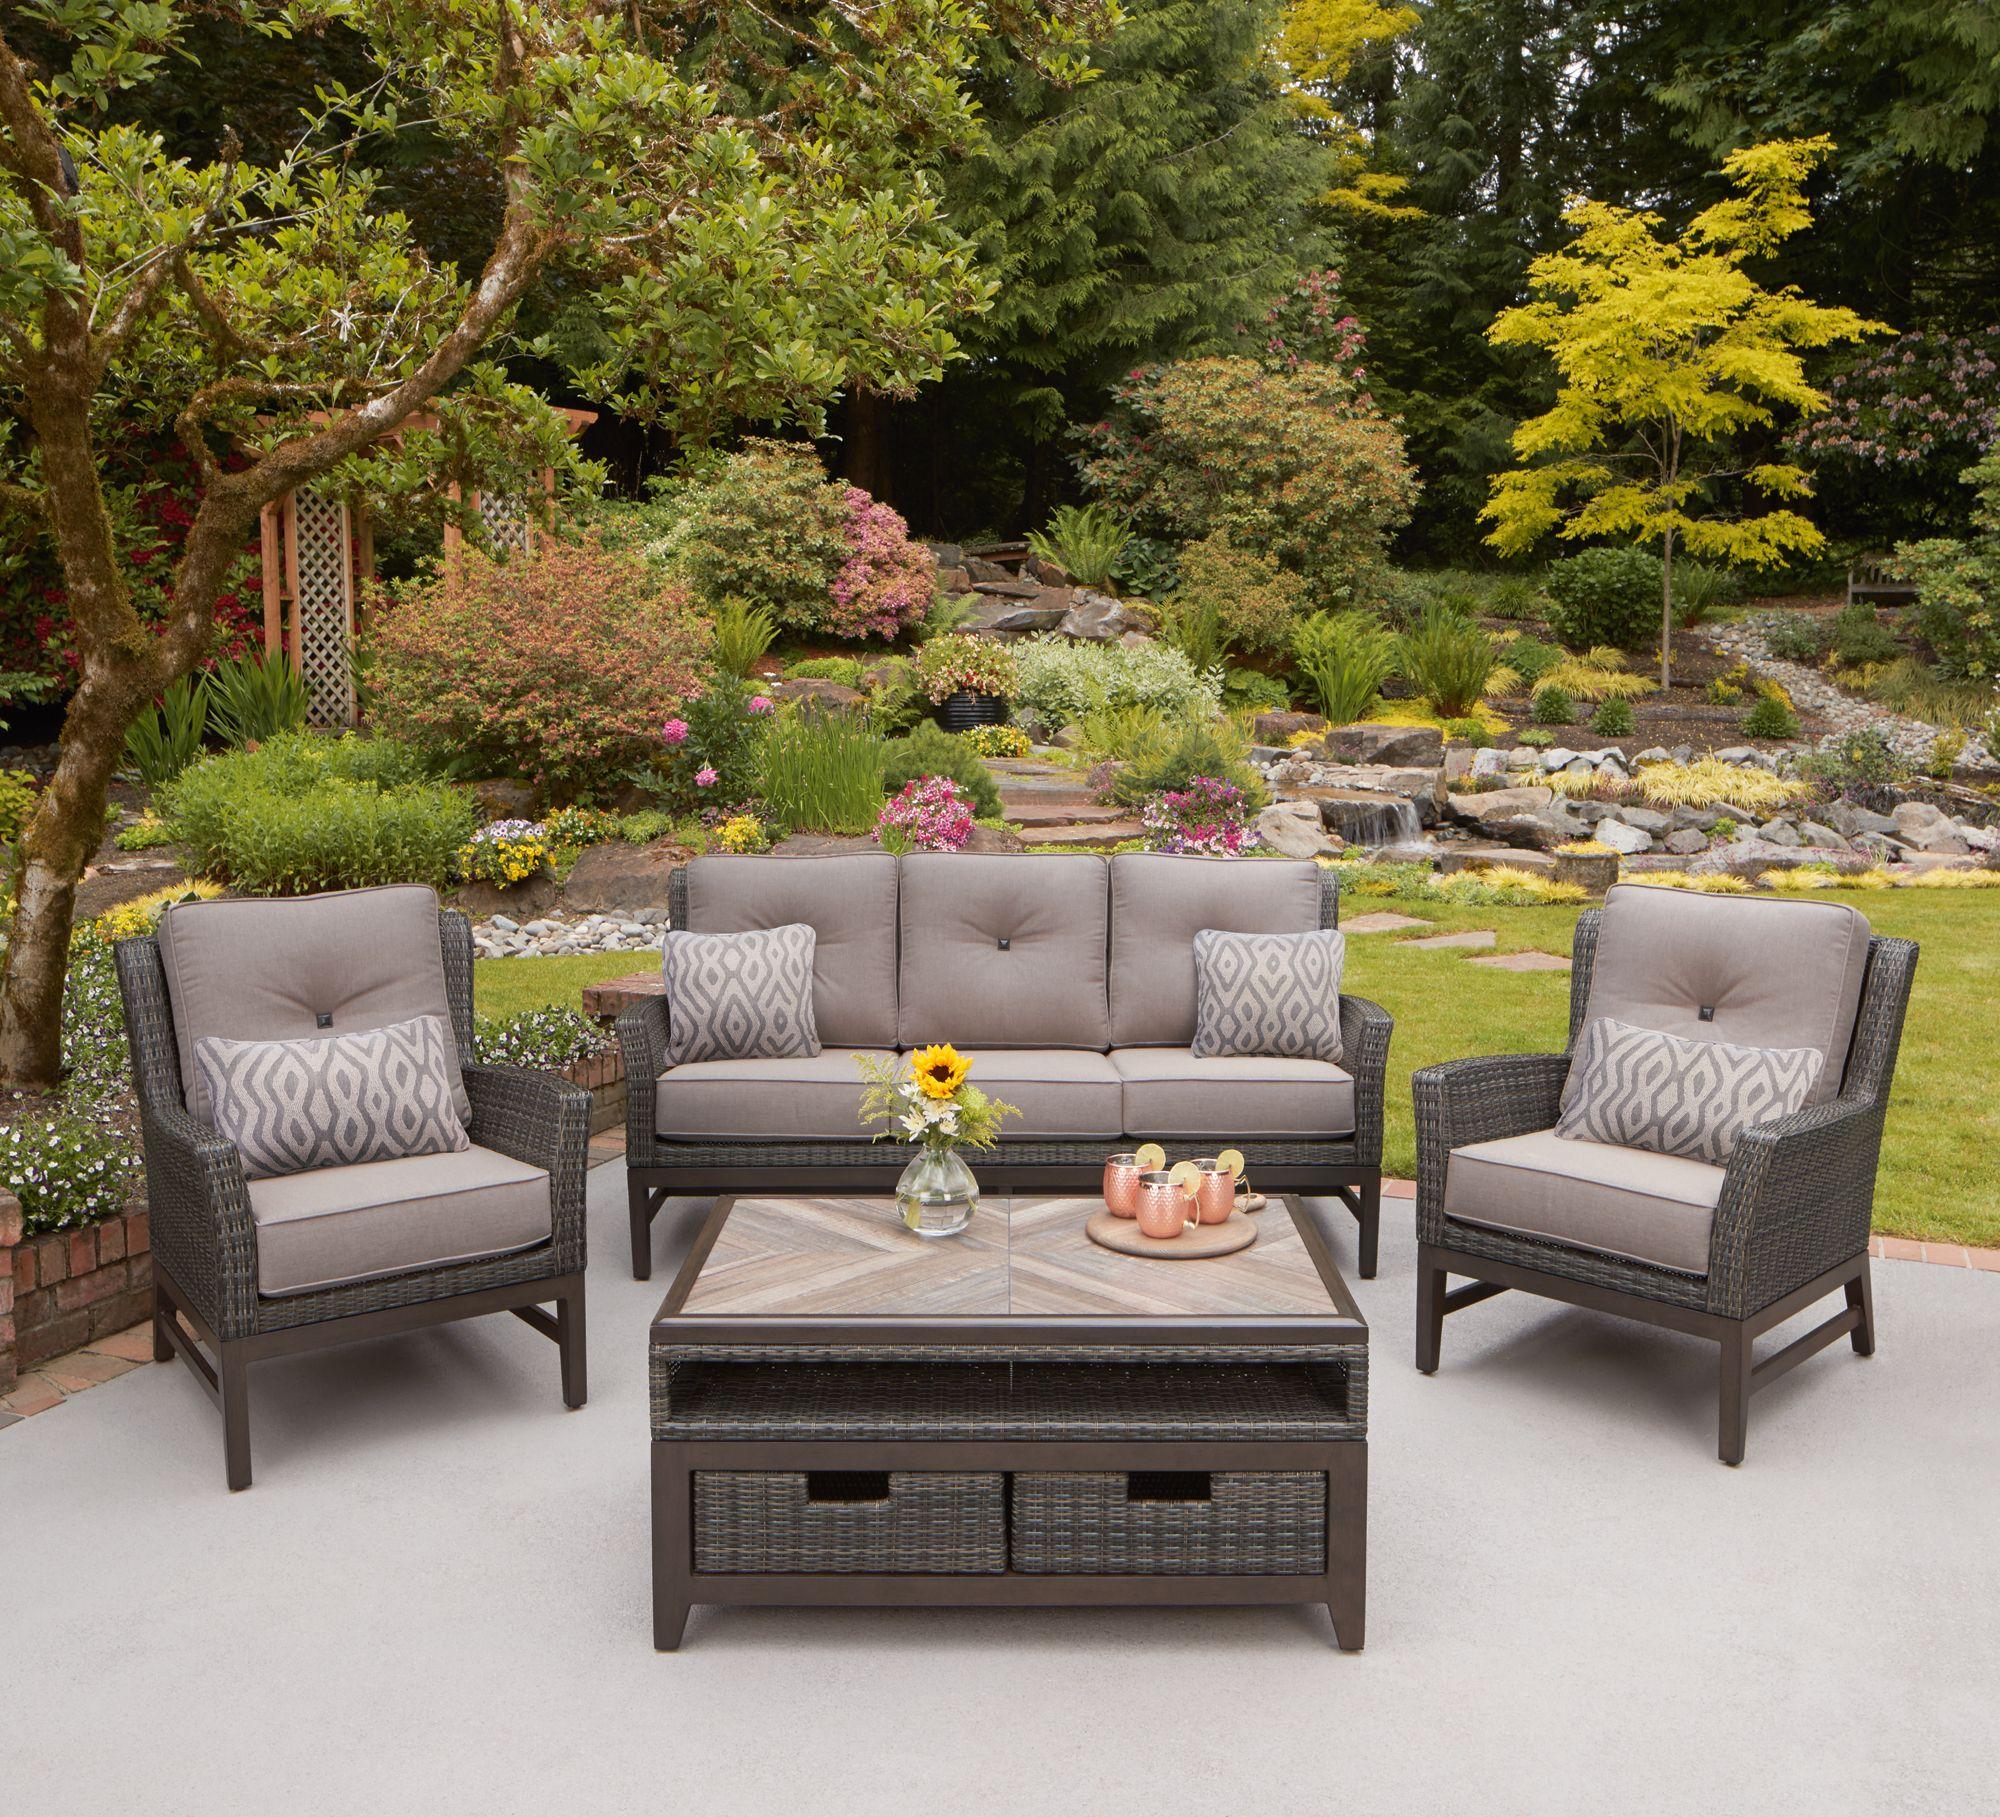 st louis 4 piece deep seating set rh costco com forshaw patio furniture st louis outdoor patio furniture st louis